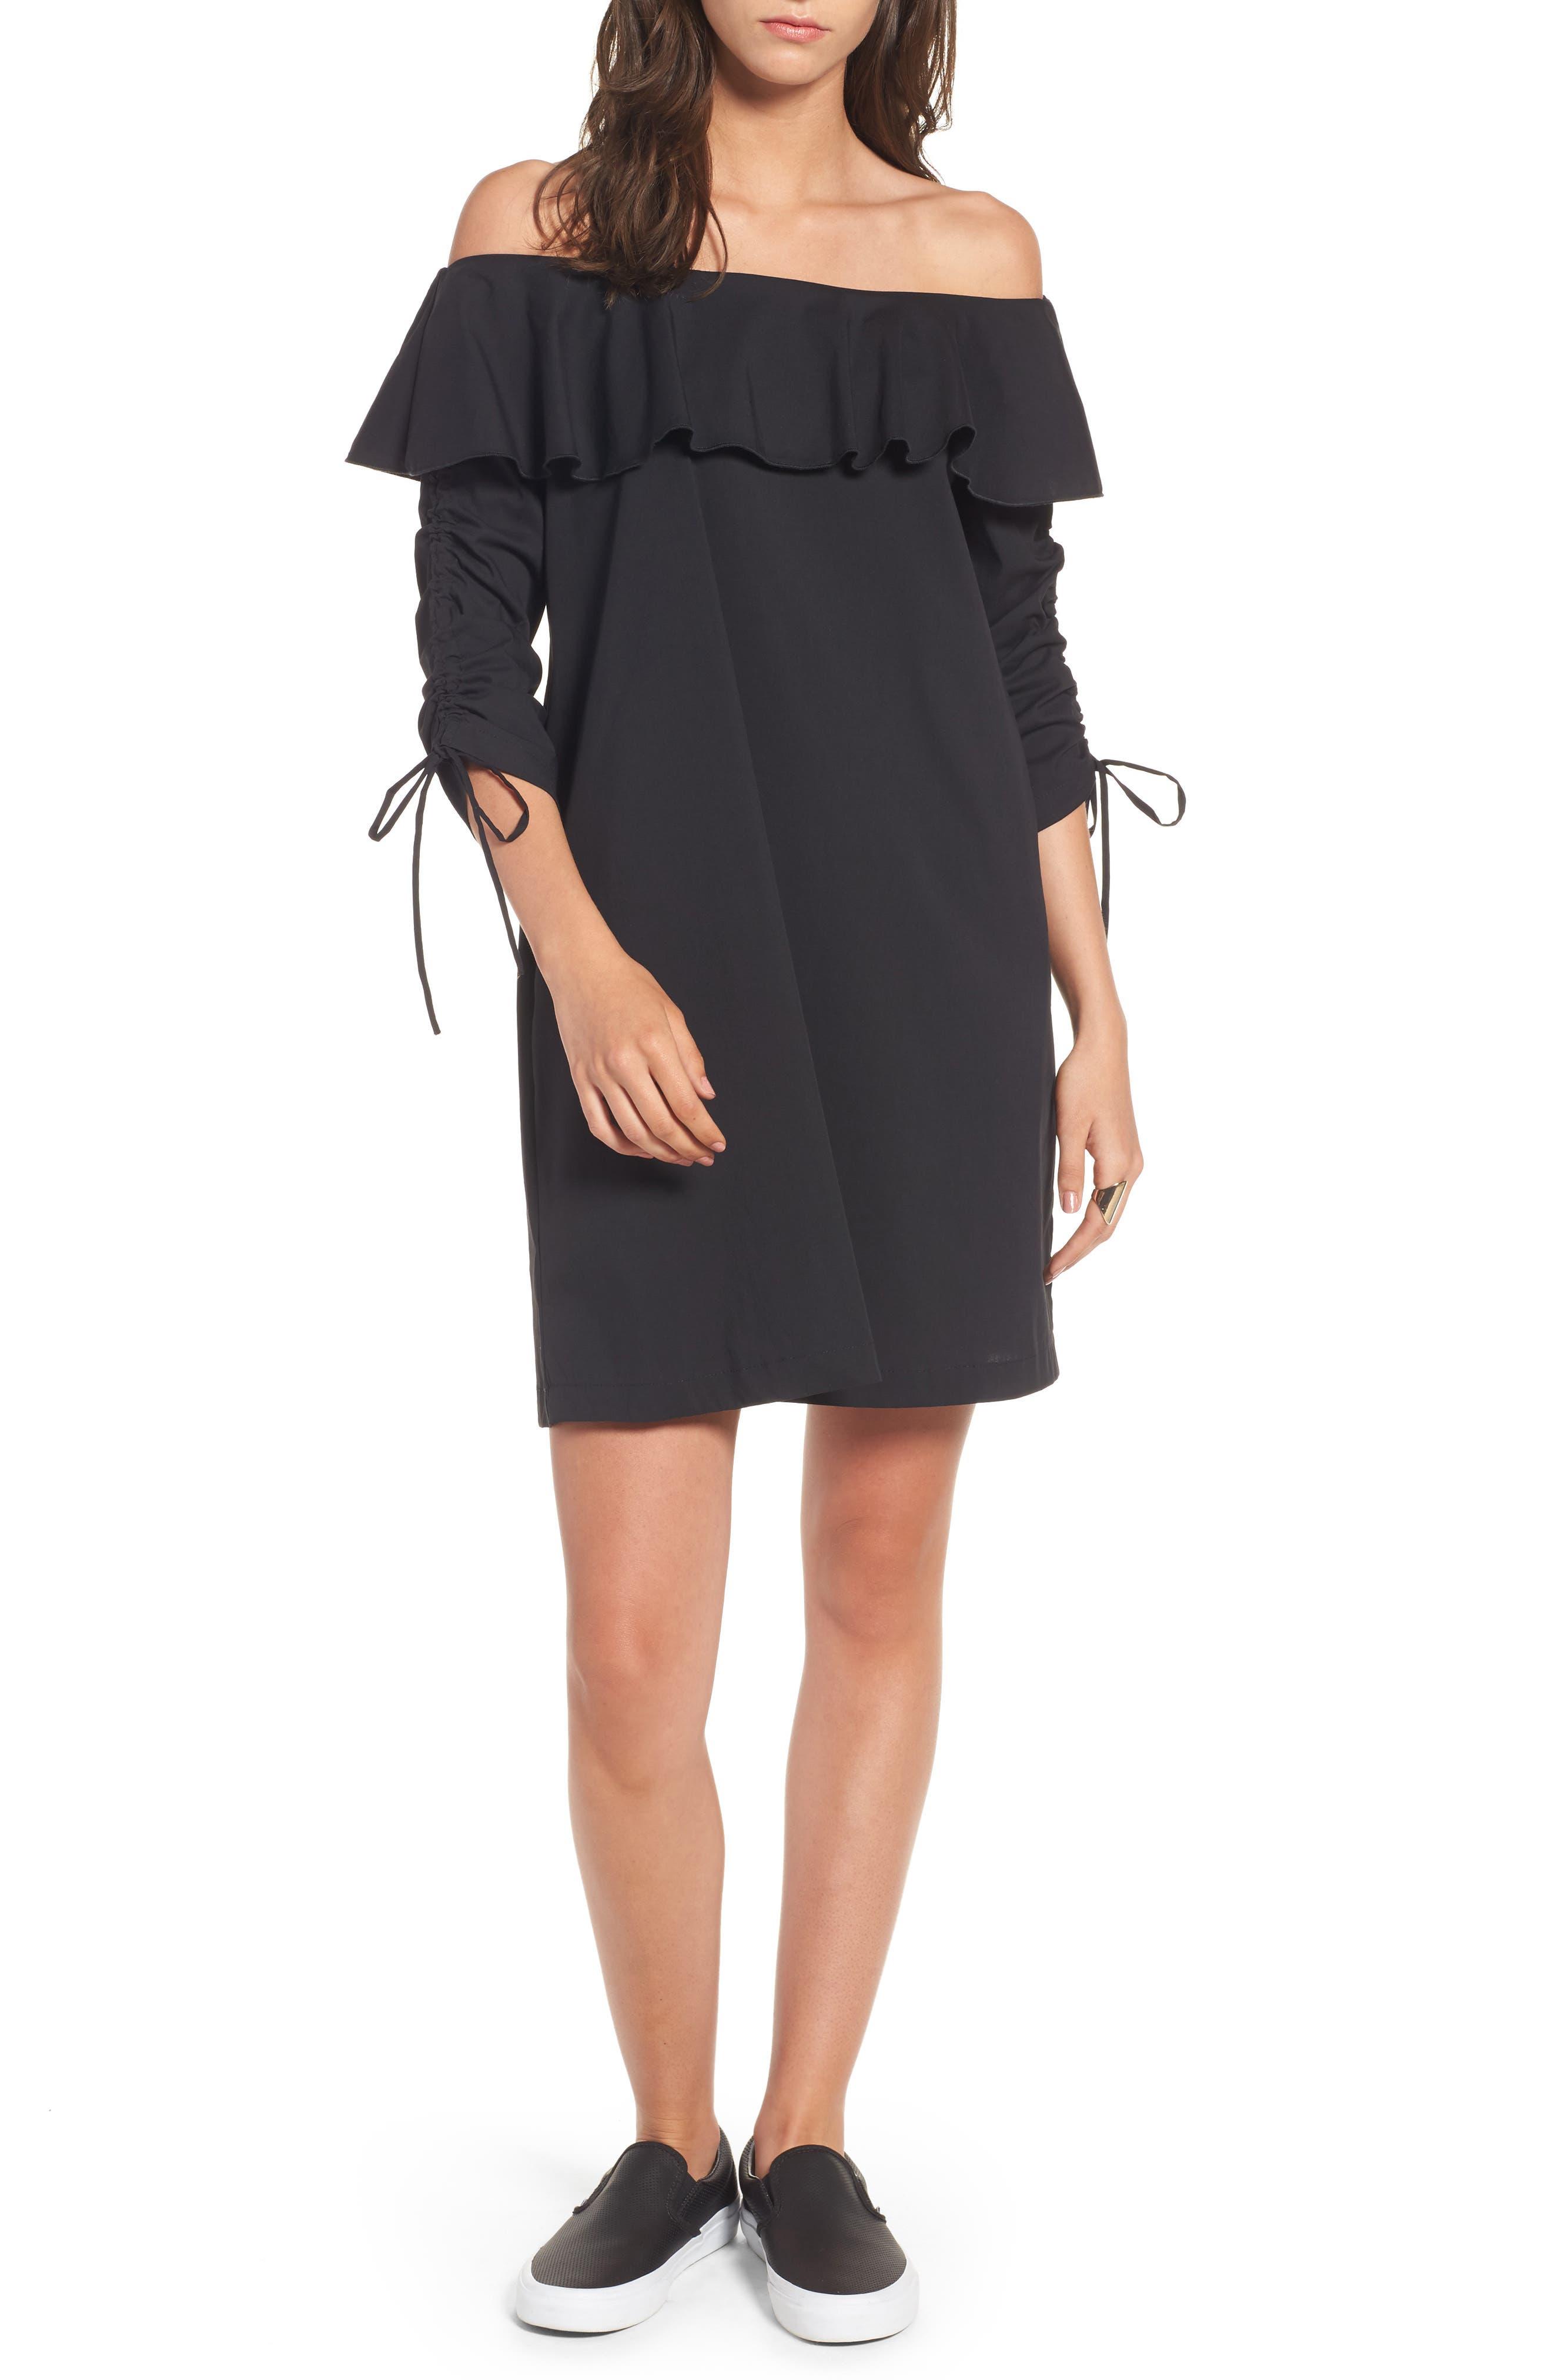 Cinch Sleeve Off the Shoulder Dress,                         Main,                         color, 001